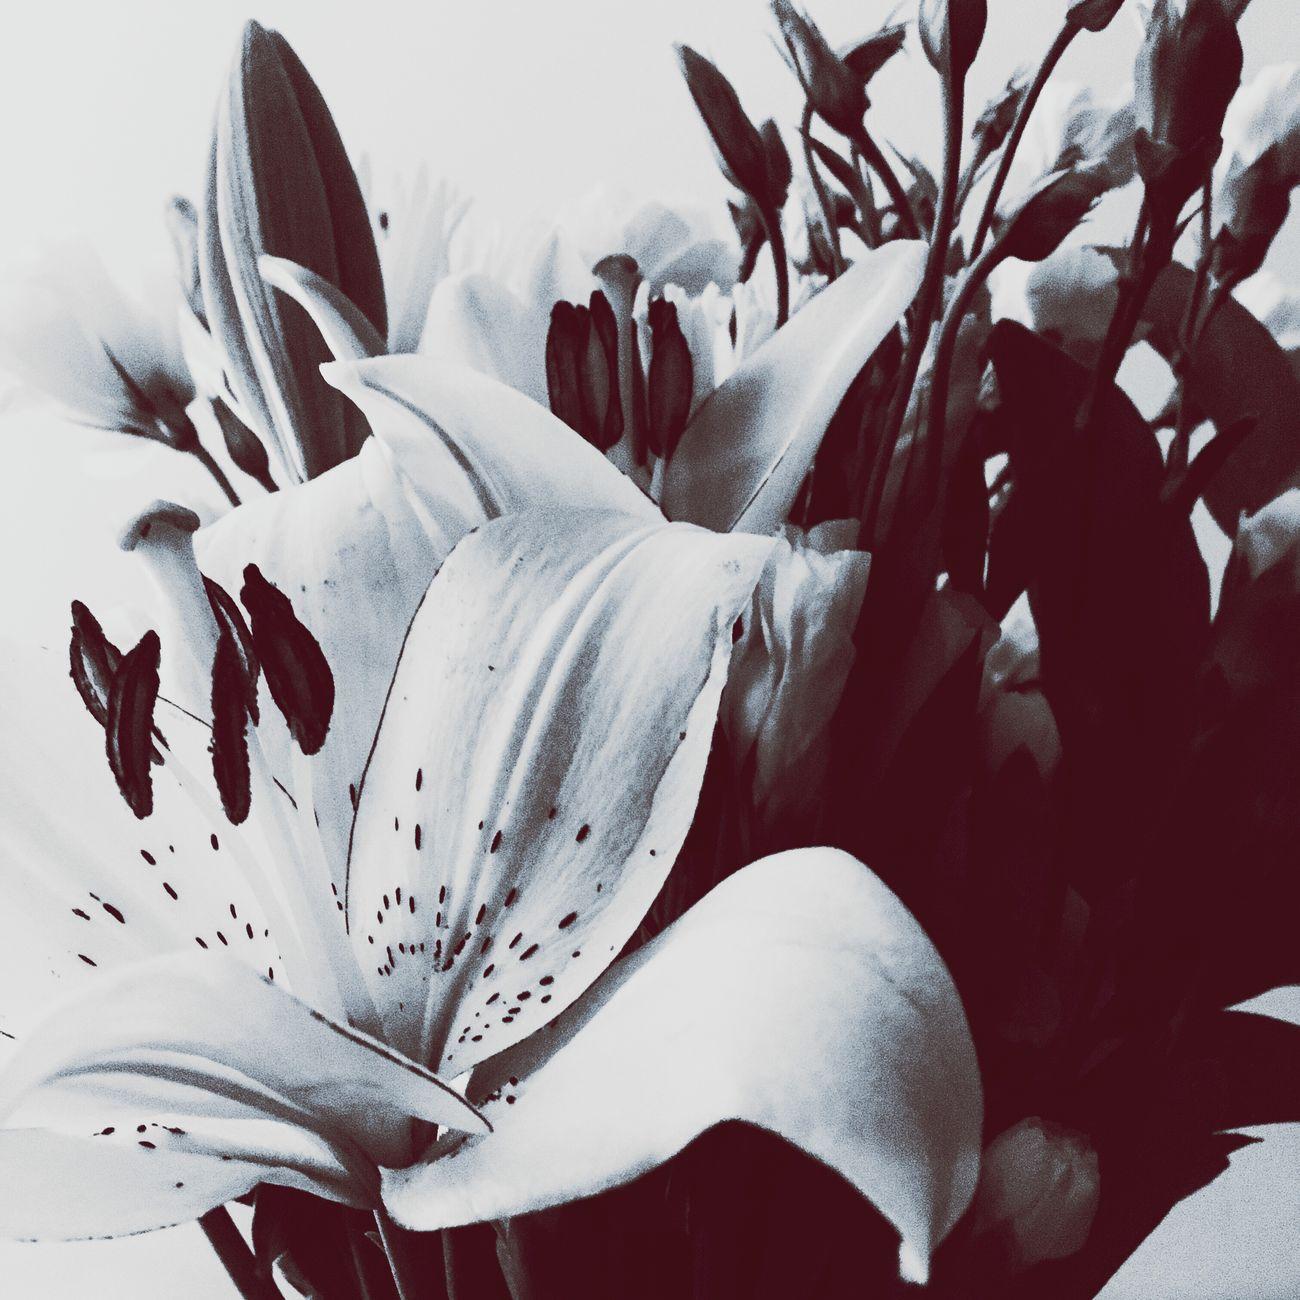 Morning + Light + Flowers Nature No People Plant Freshness